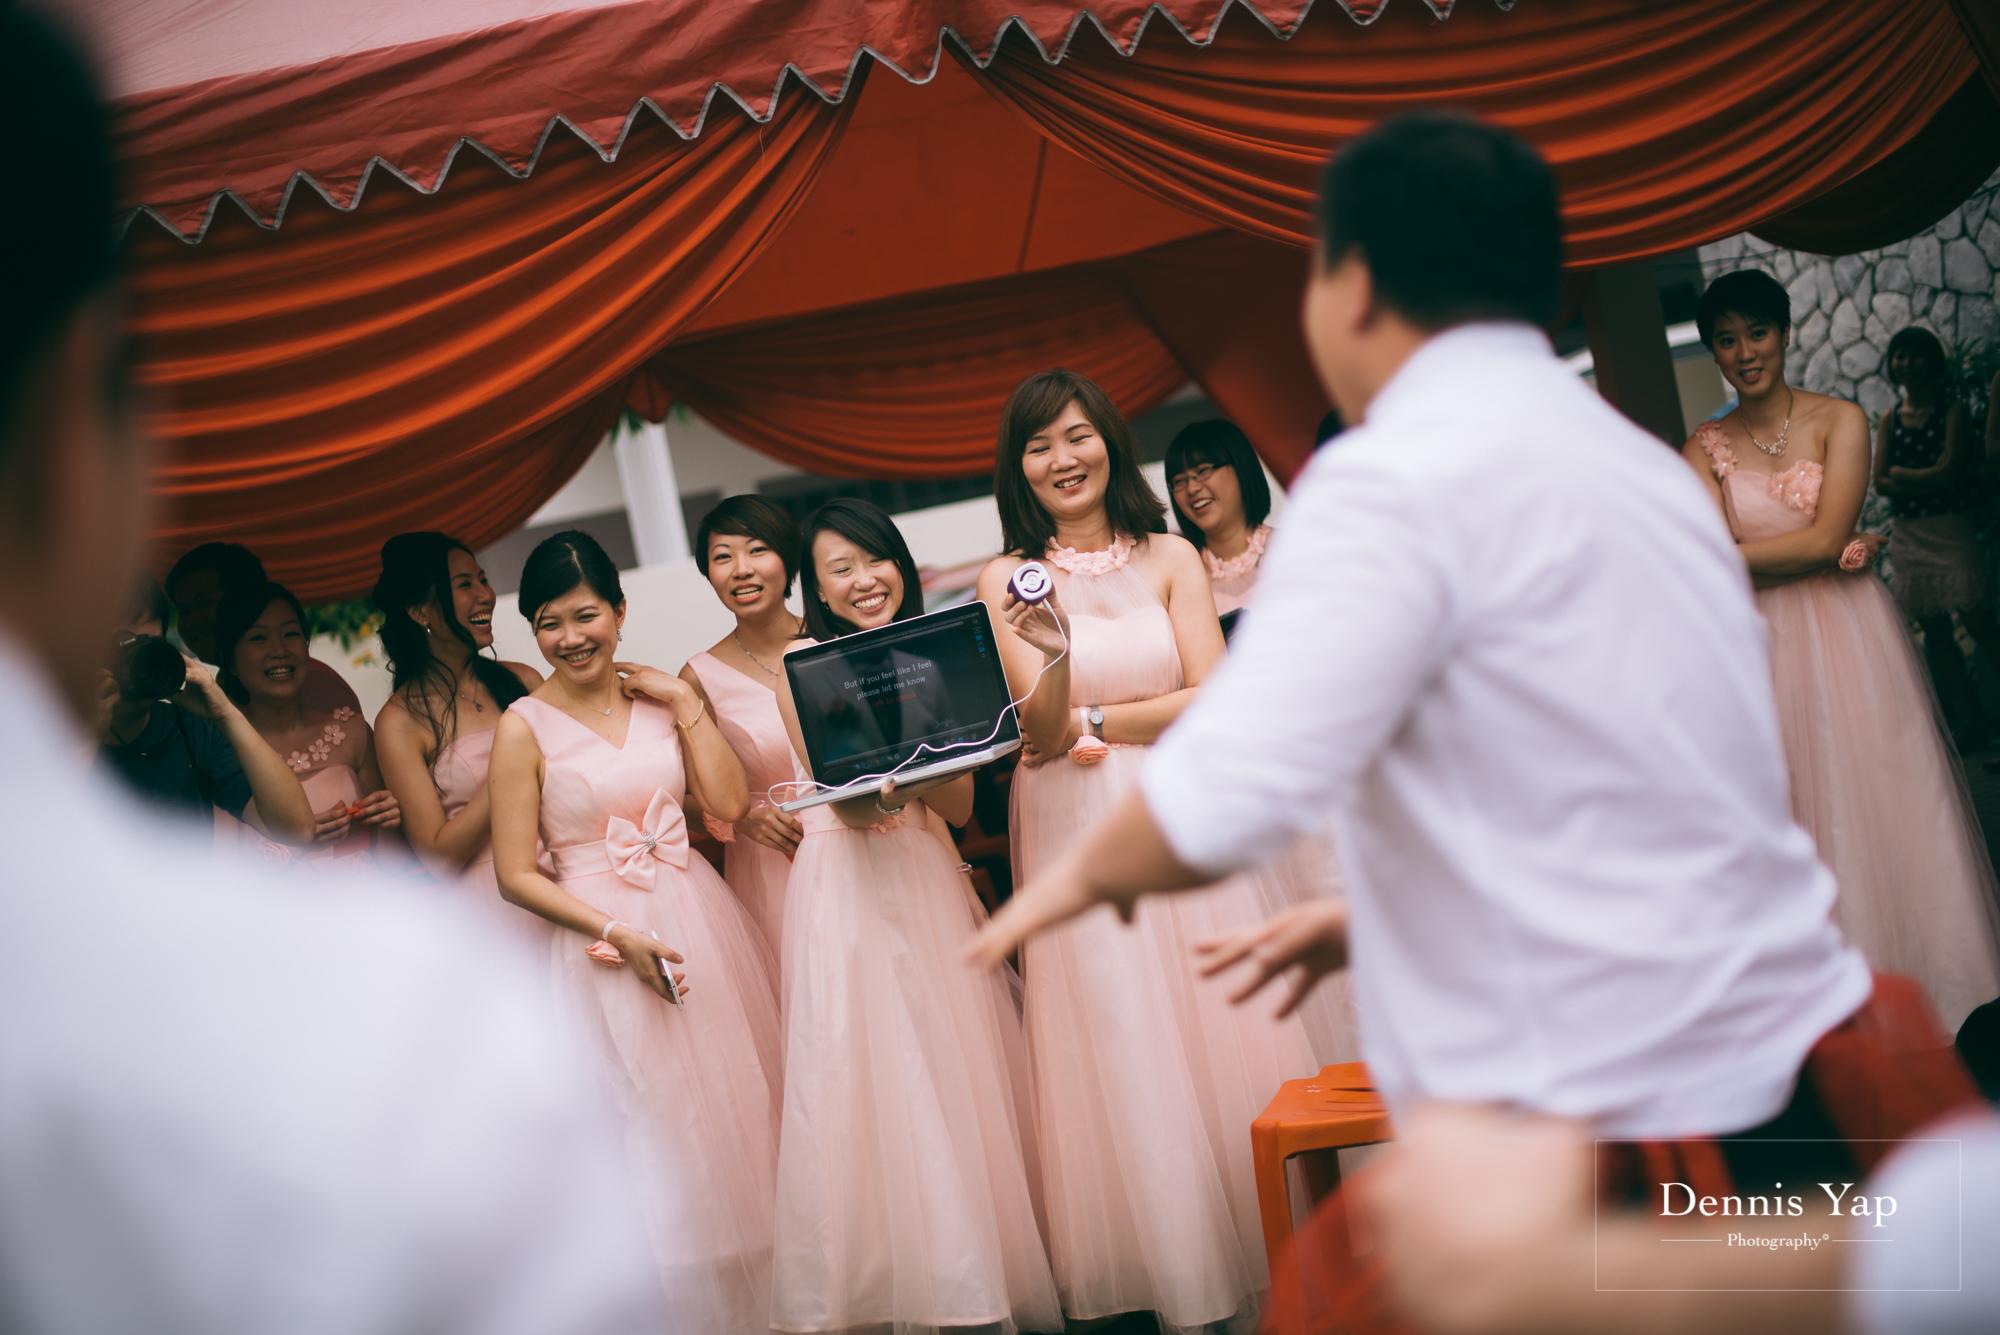 alex shir ley wedding day gate crash subang jaya usj dennis yap photography moments-8.jpg